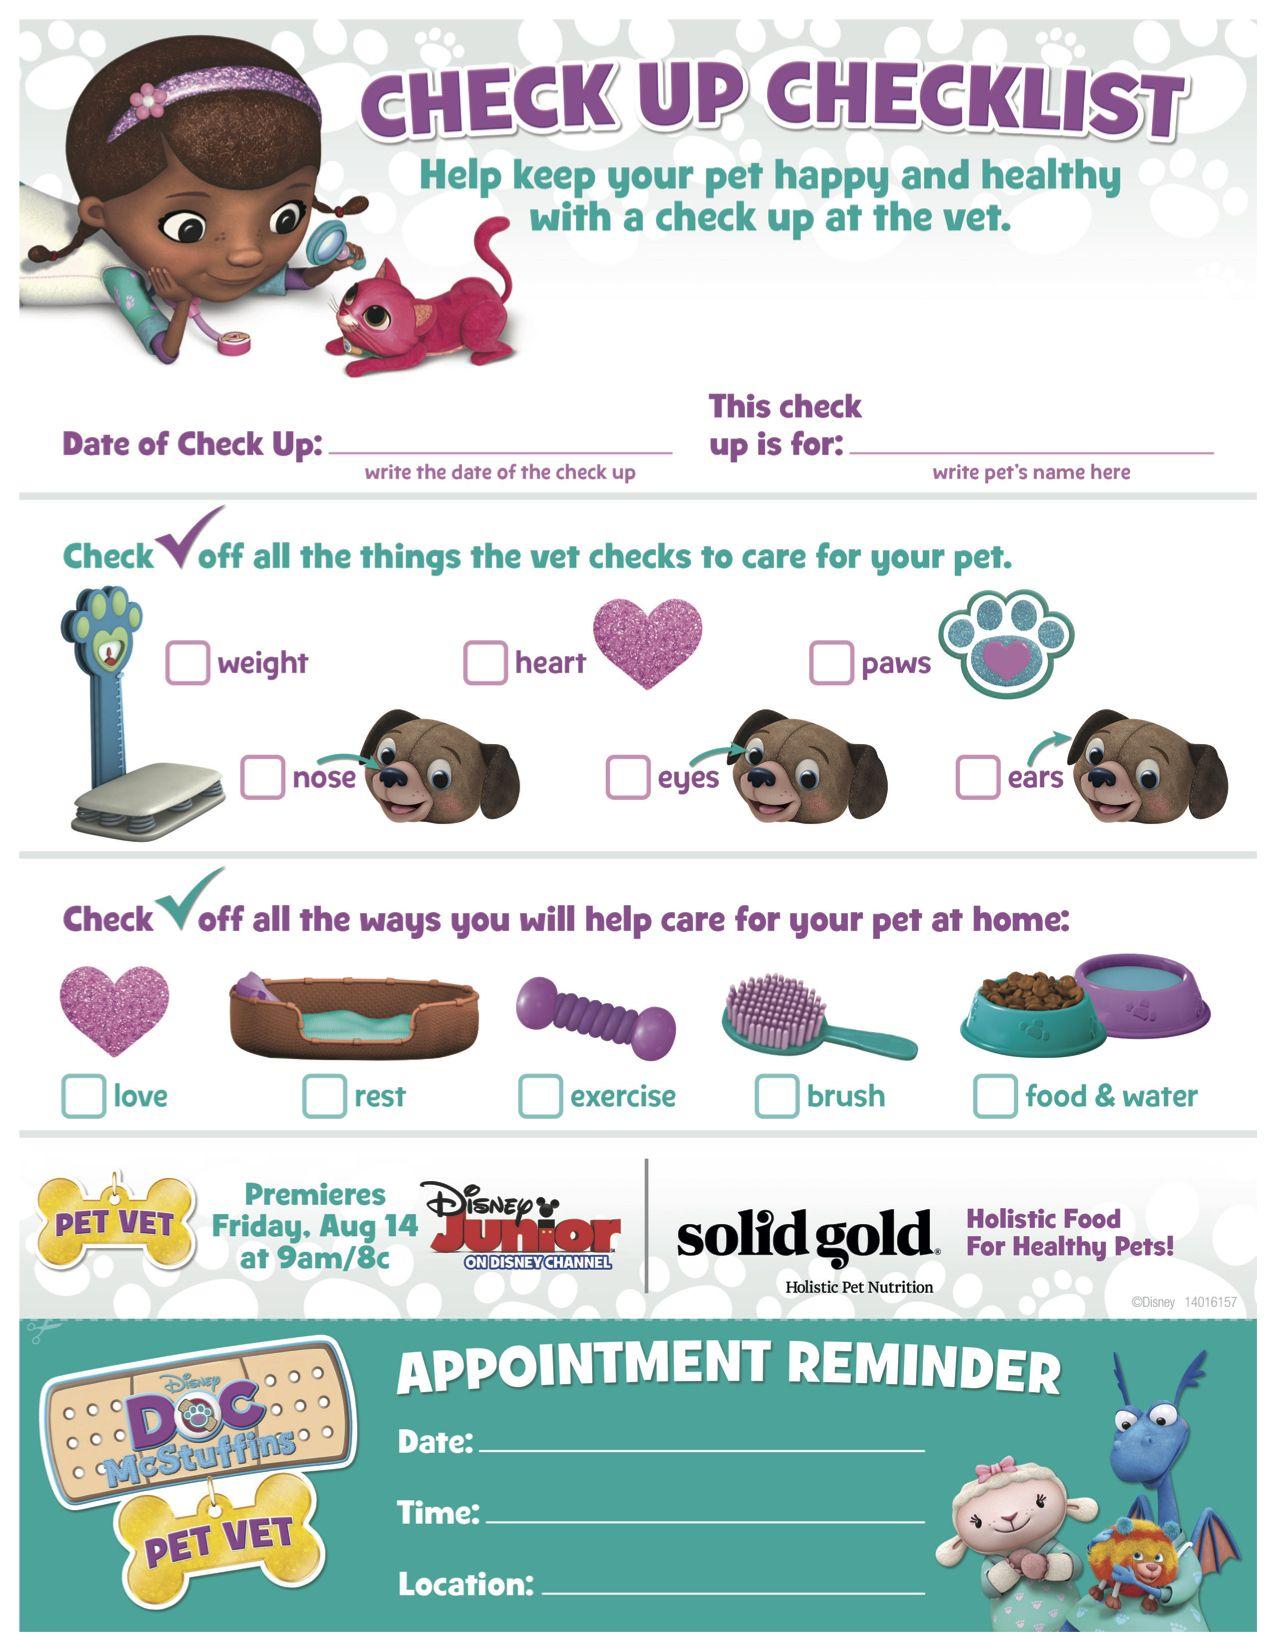 Every petloving kid has dreams of a vet. Let